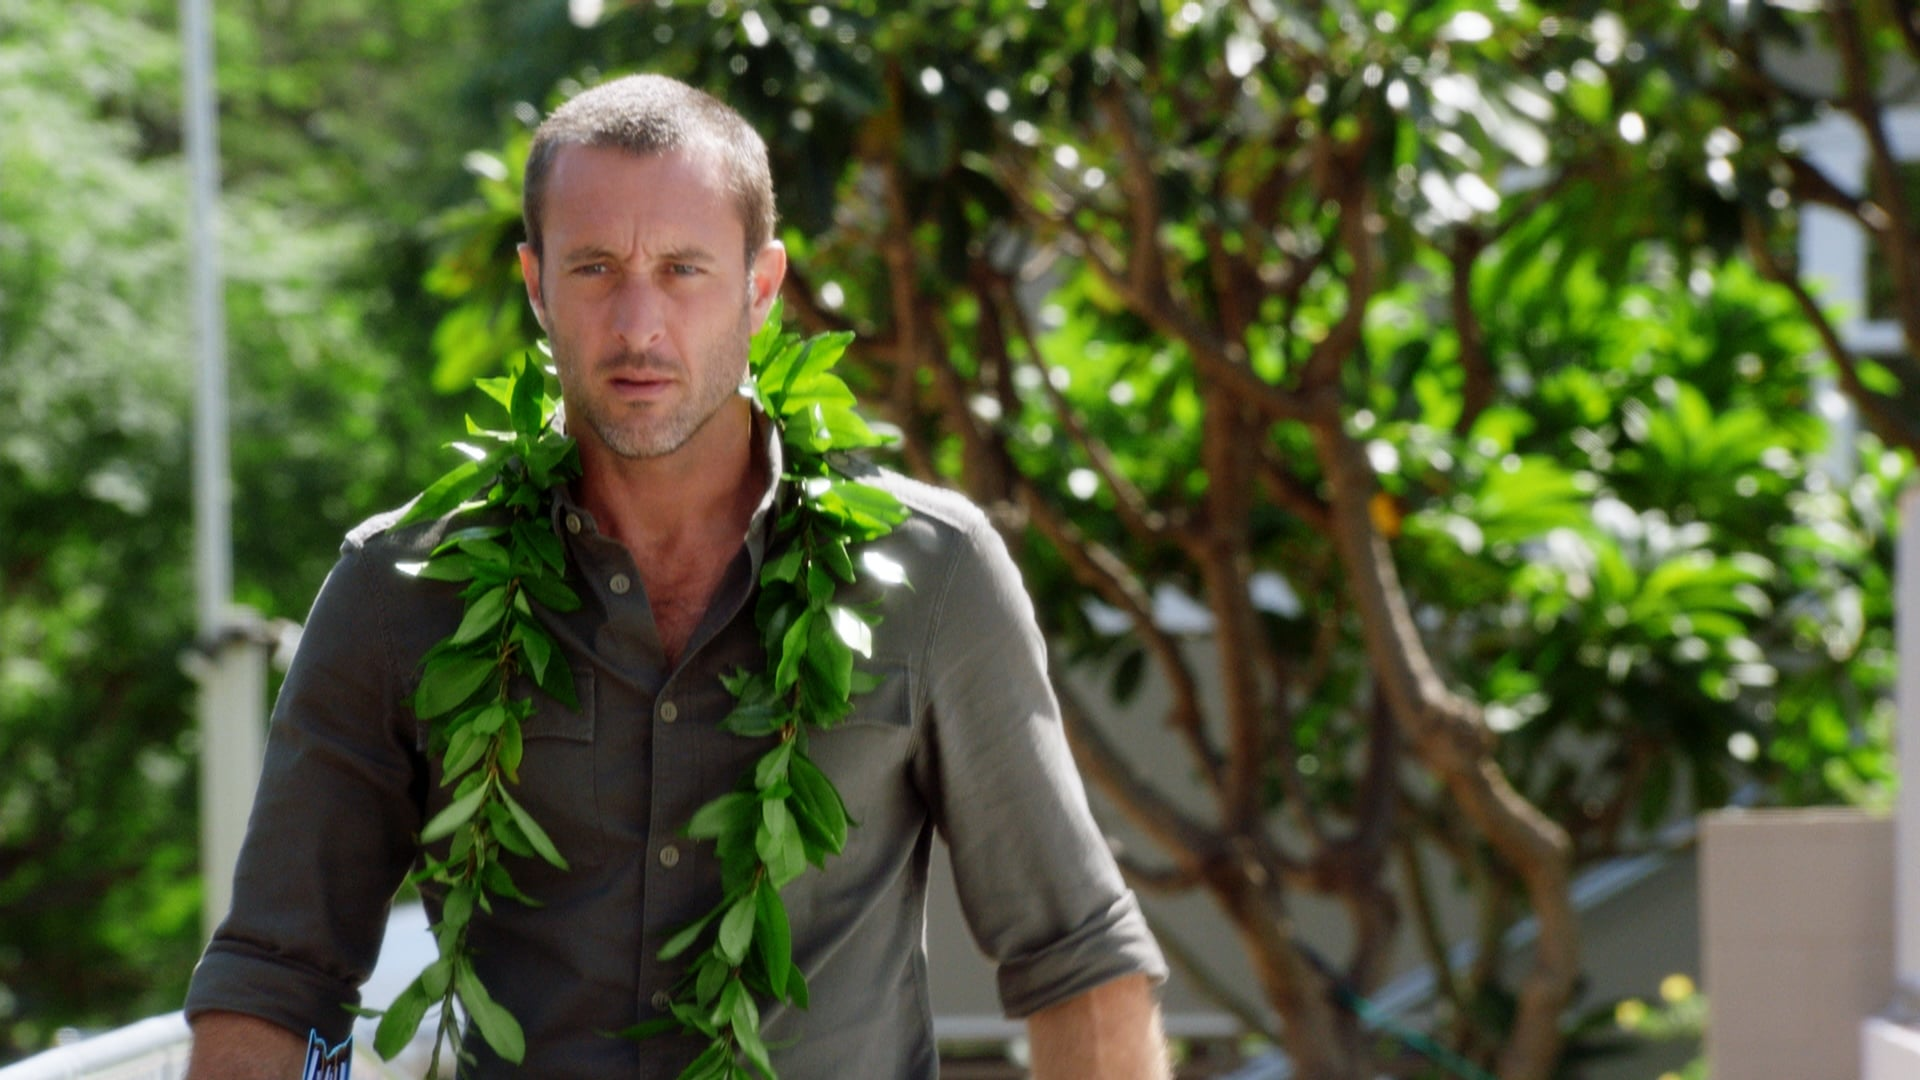 Hawaii Five-0 Season 8 :Episode 19  Aohe mea make i ka hewa; make no i ka mihi ole (No One Has Ever Died For the Mistakes He Has Made; Only Because He Didn't Repent)